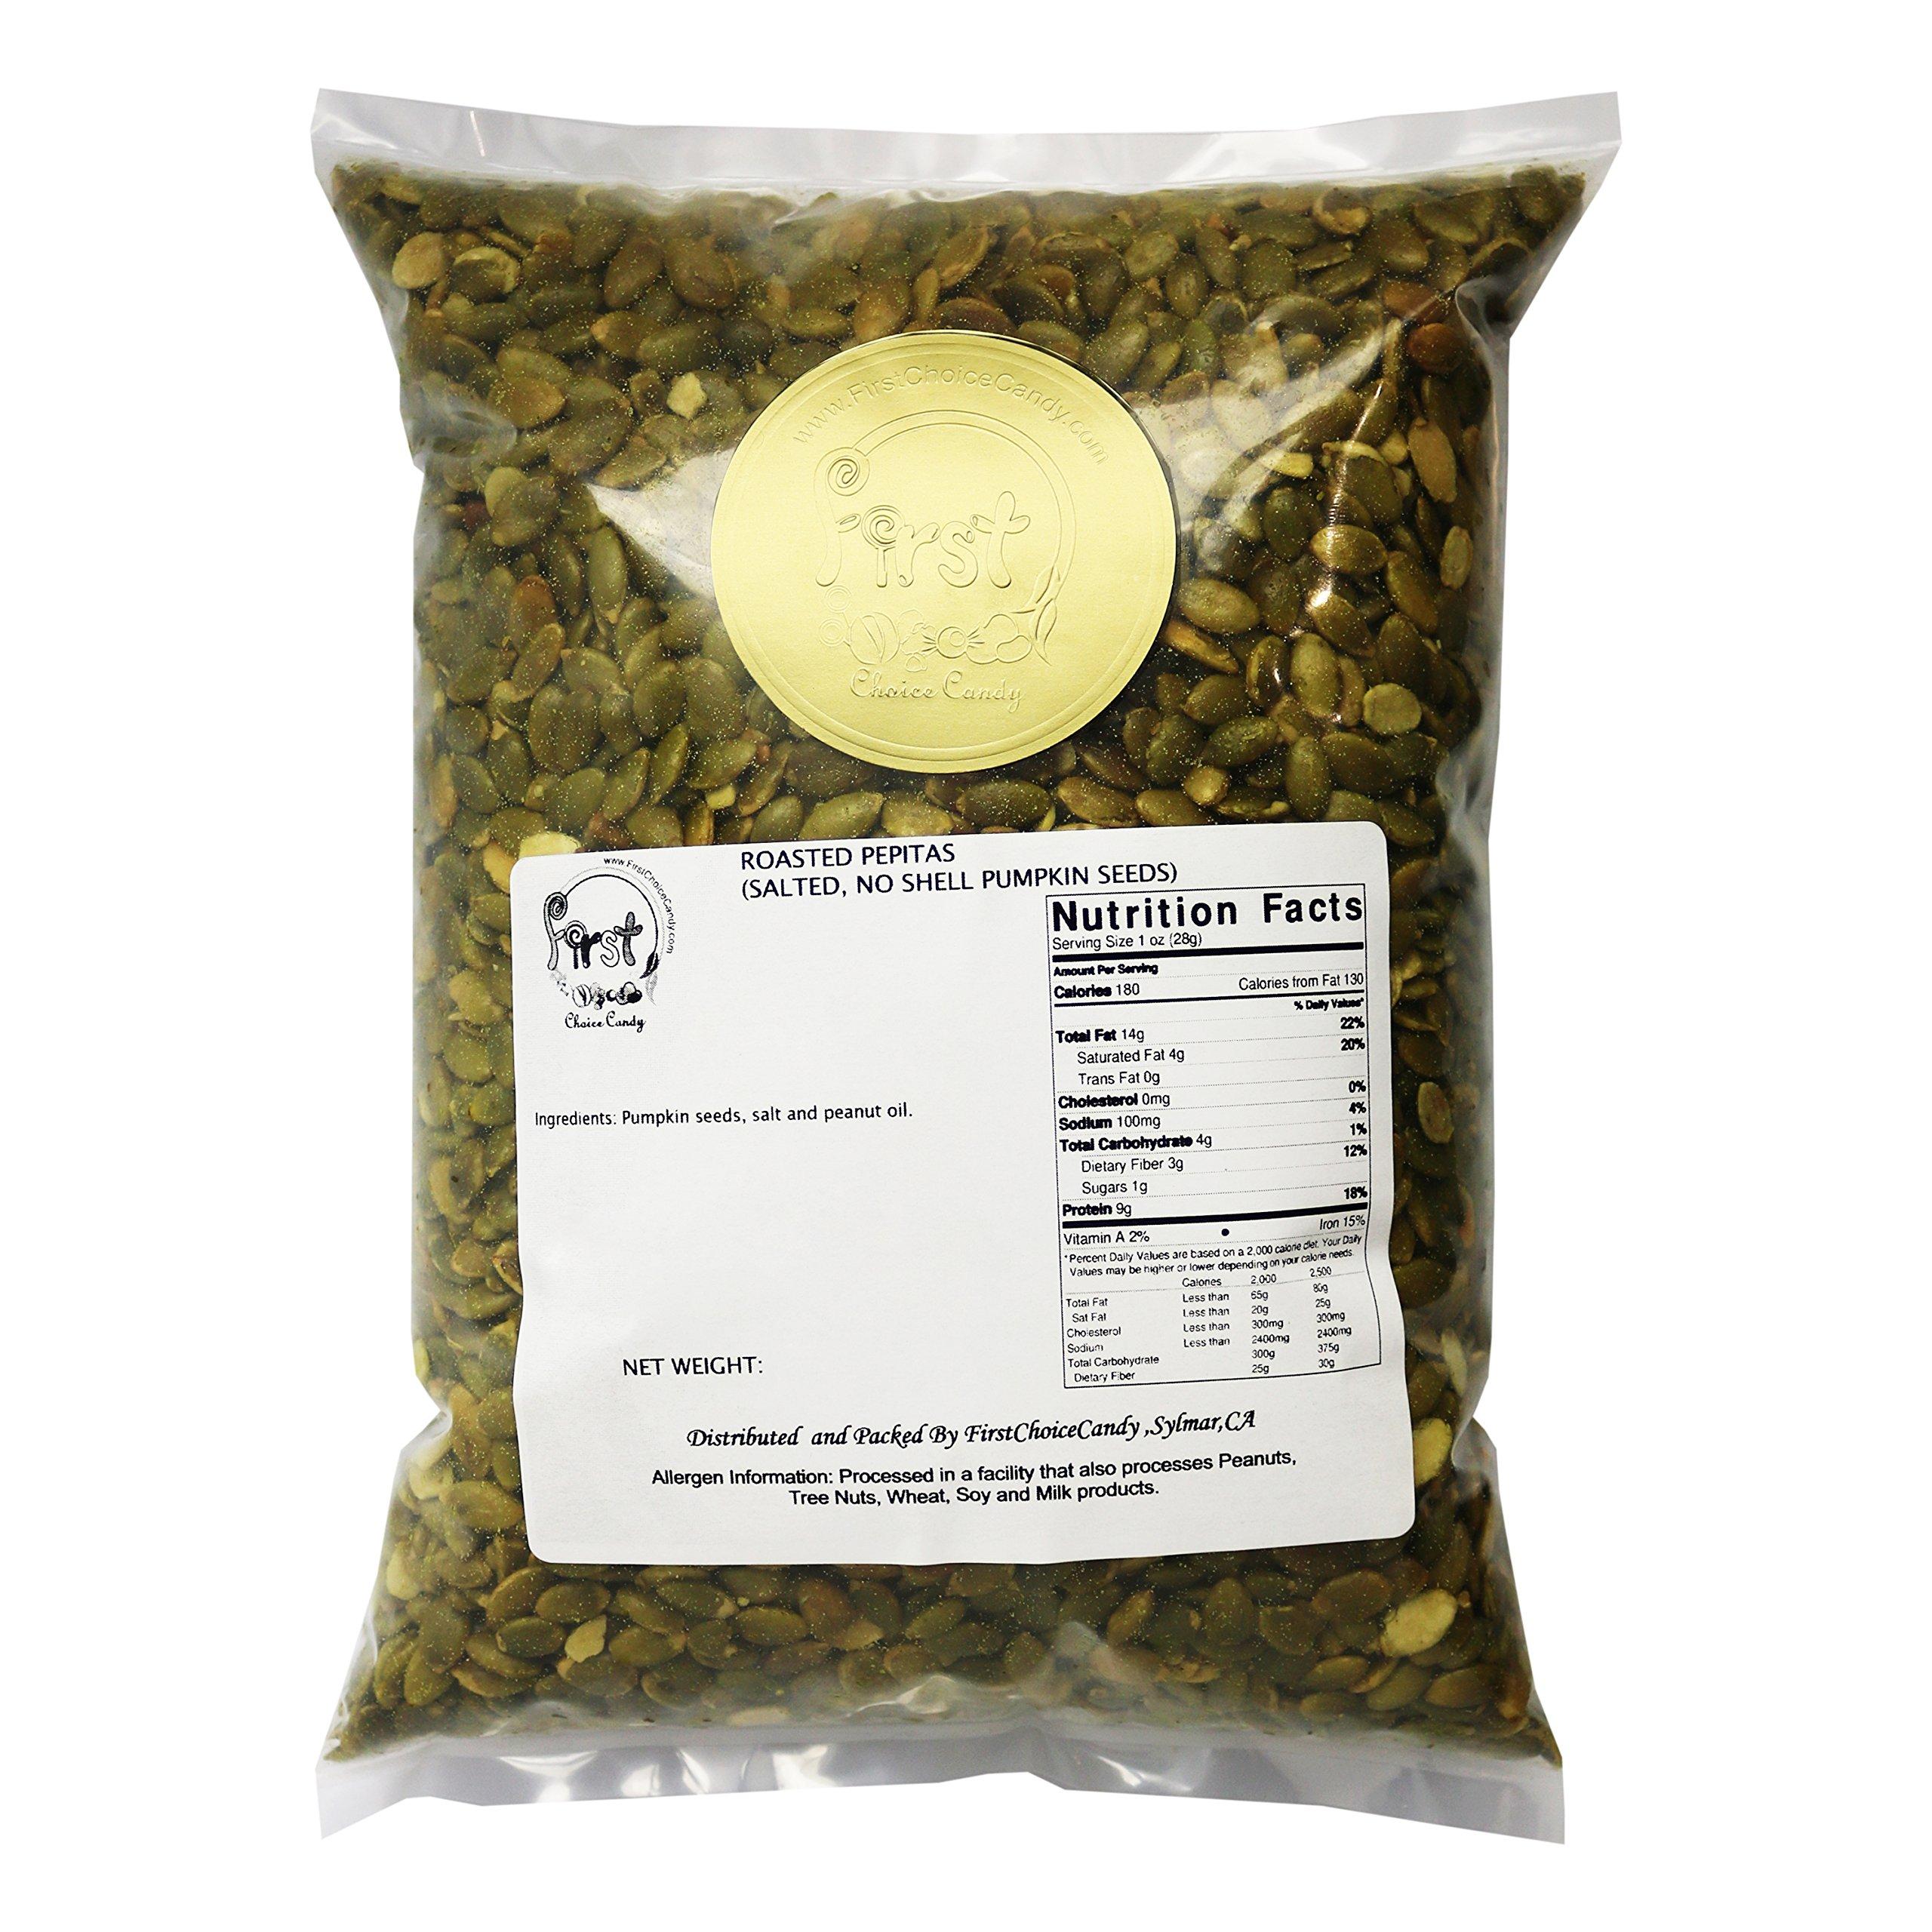 Pumpkin Seeds Pepitas Roasted/Salted 3 Pound Bulk Bag by FirstChoiceCandy